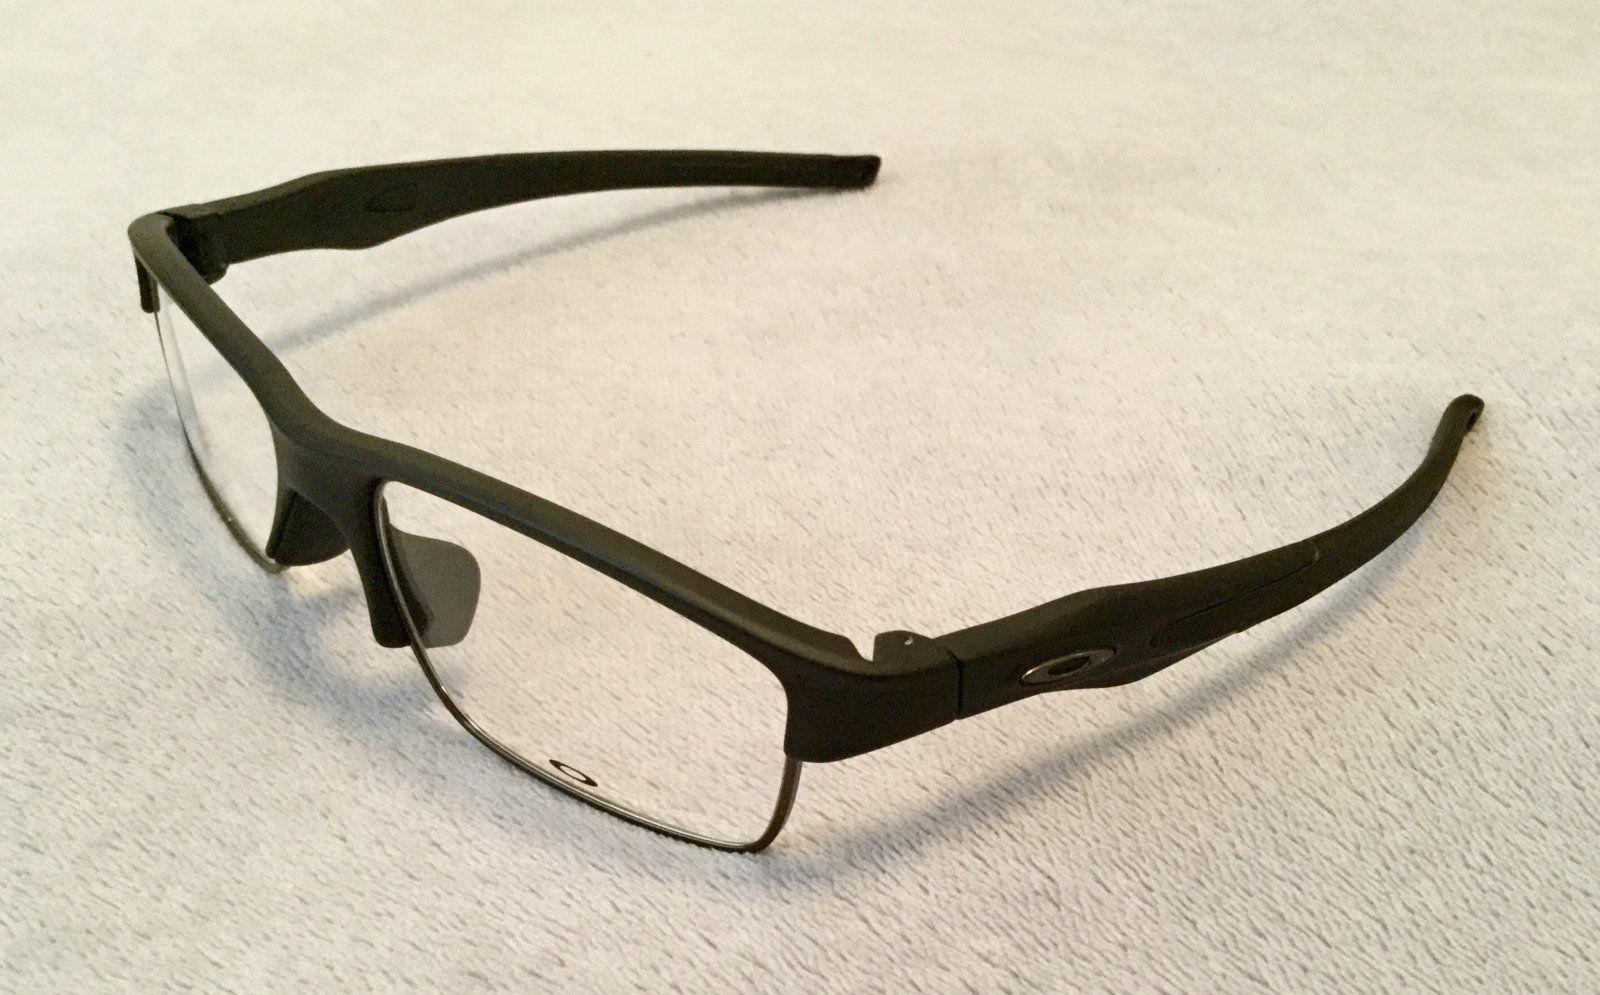 00620b64a71a Oakley A Crosslink Switch (56) Eyeglasses (New) - 0A0211CE-A736-